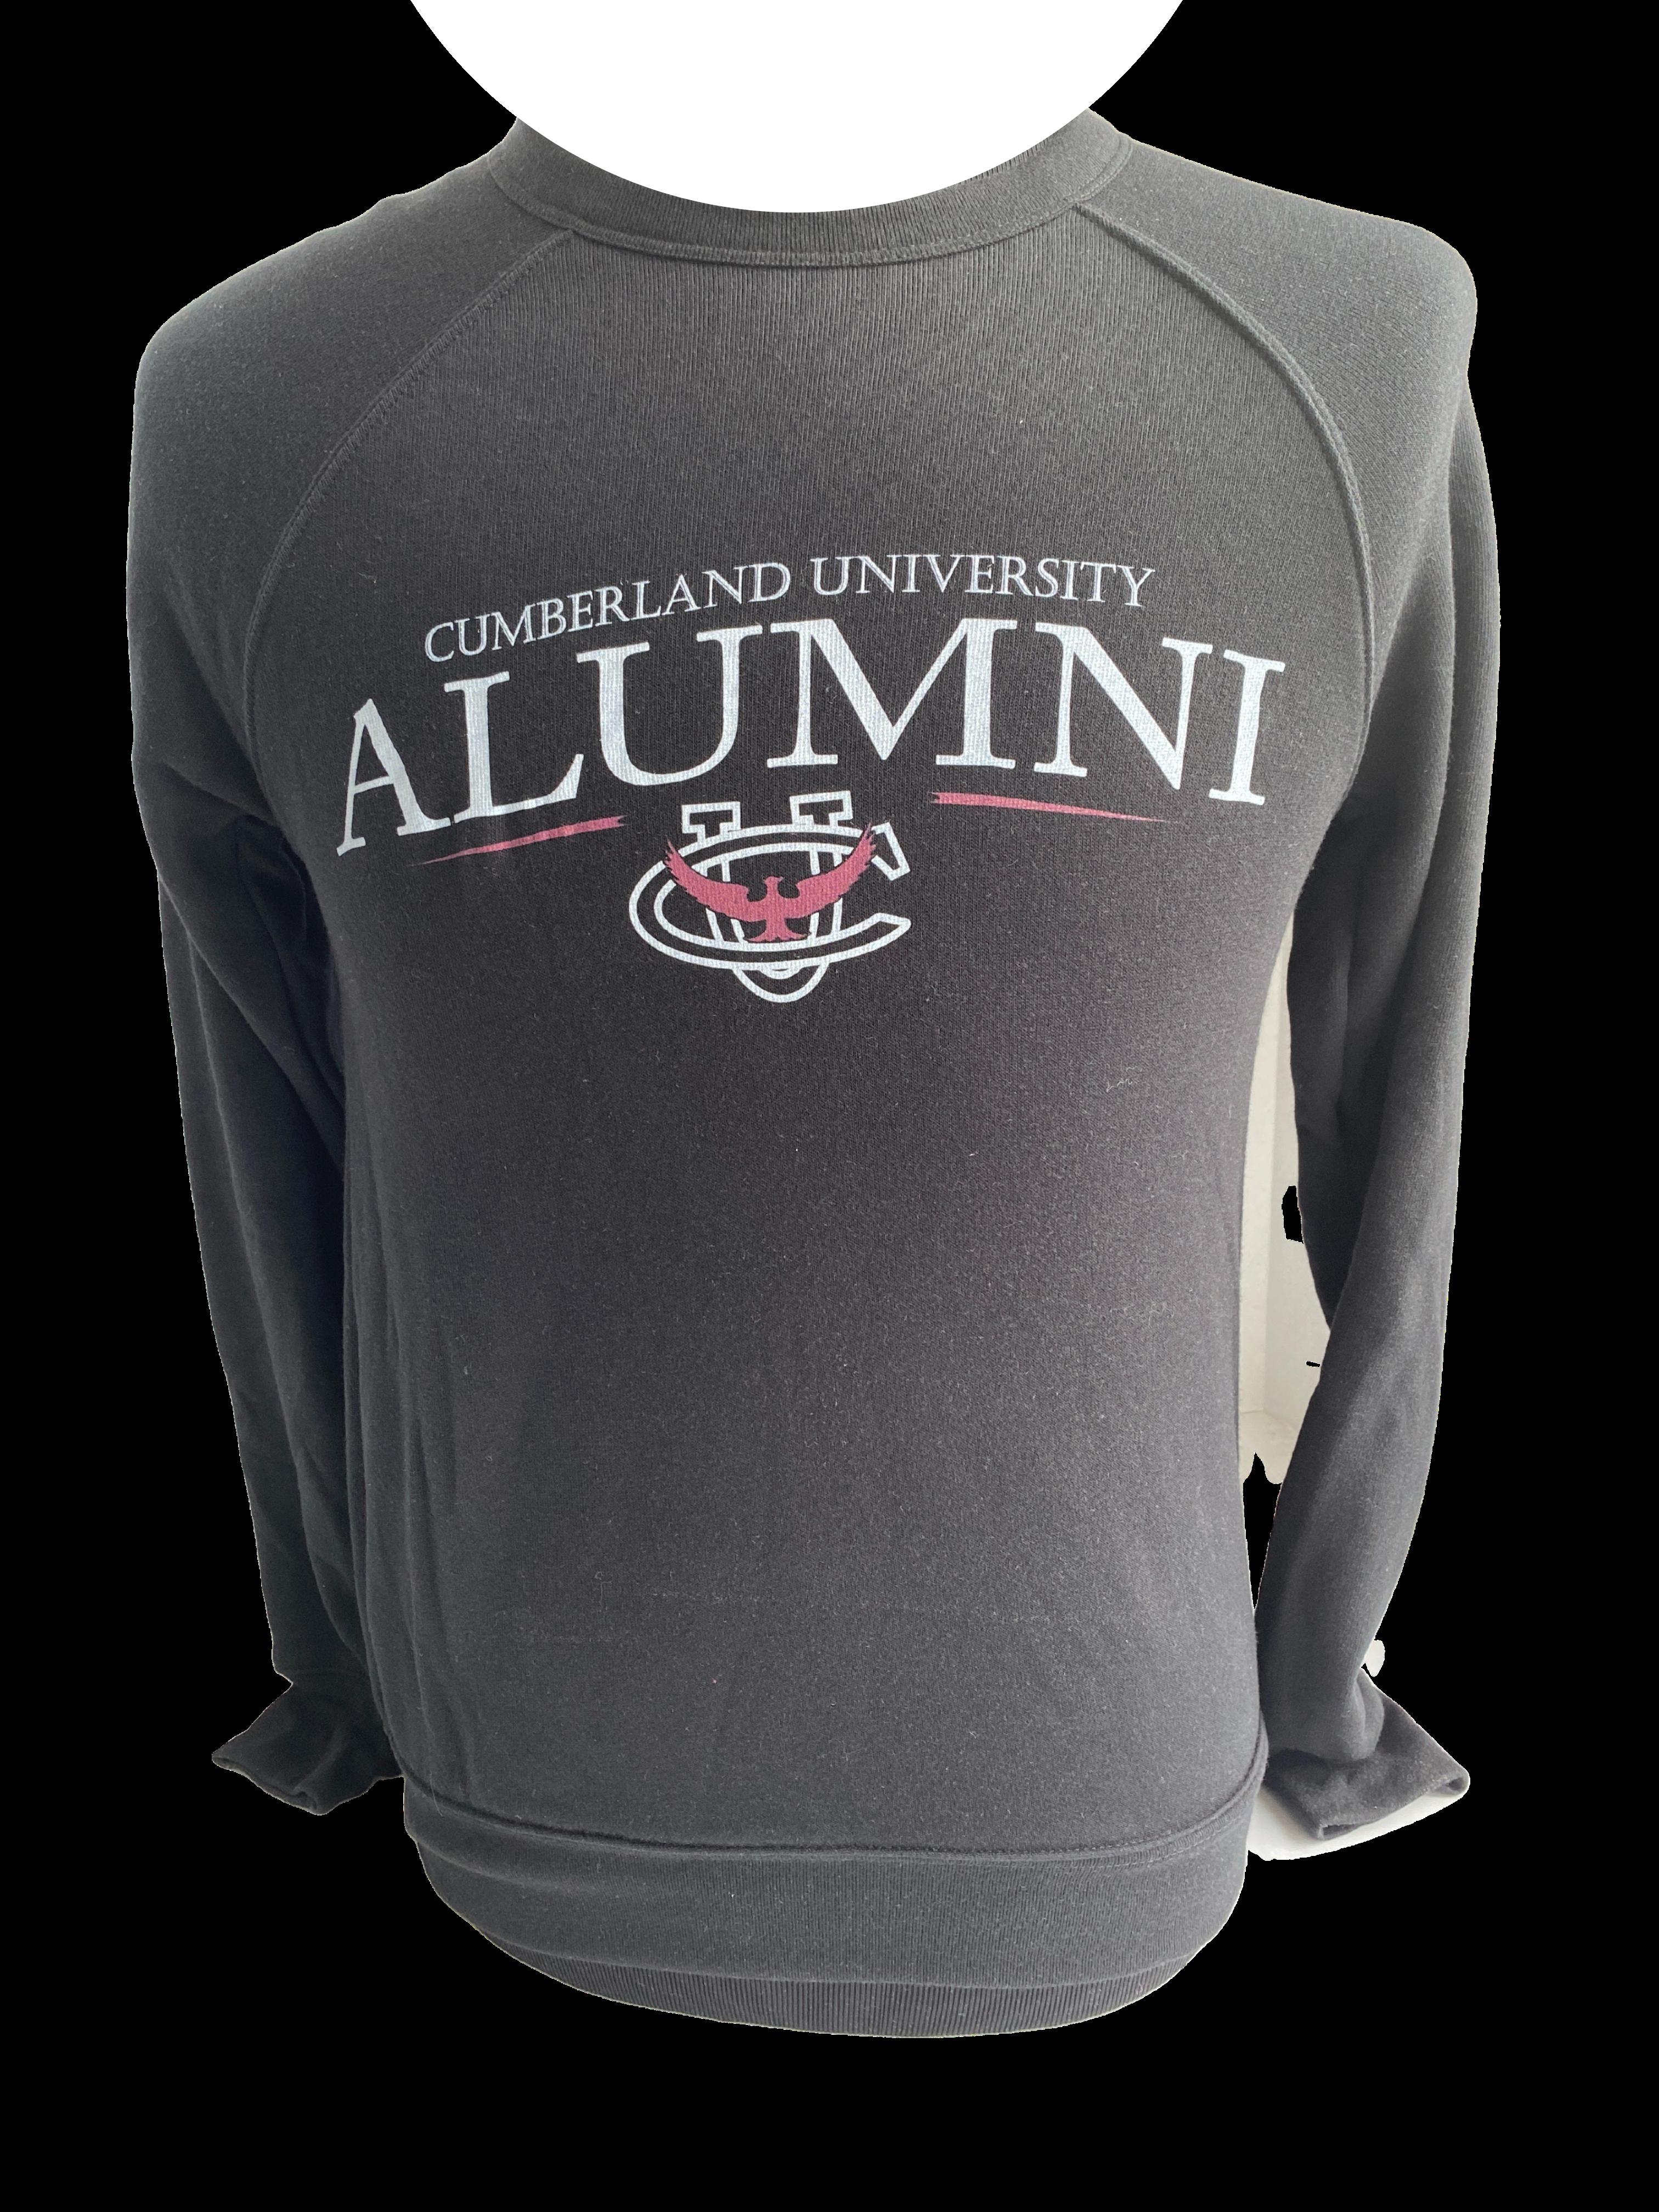 Cumberland University Alumni Crewneck Sweatshirt